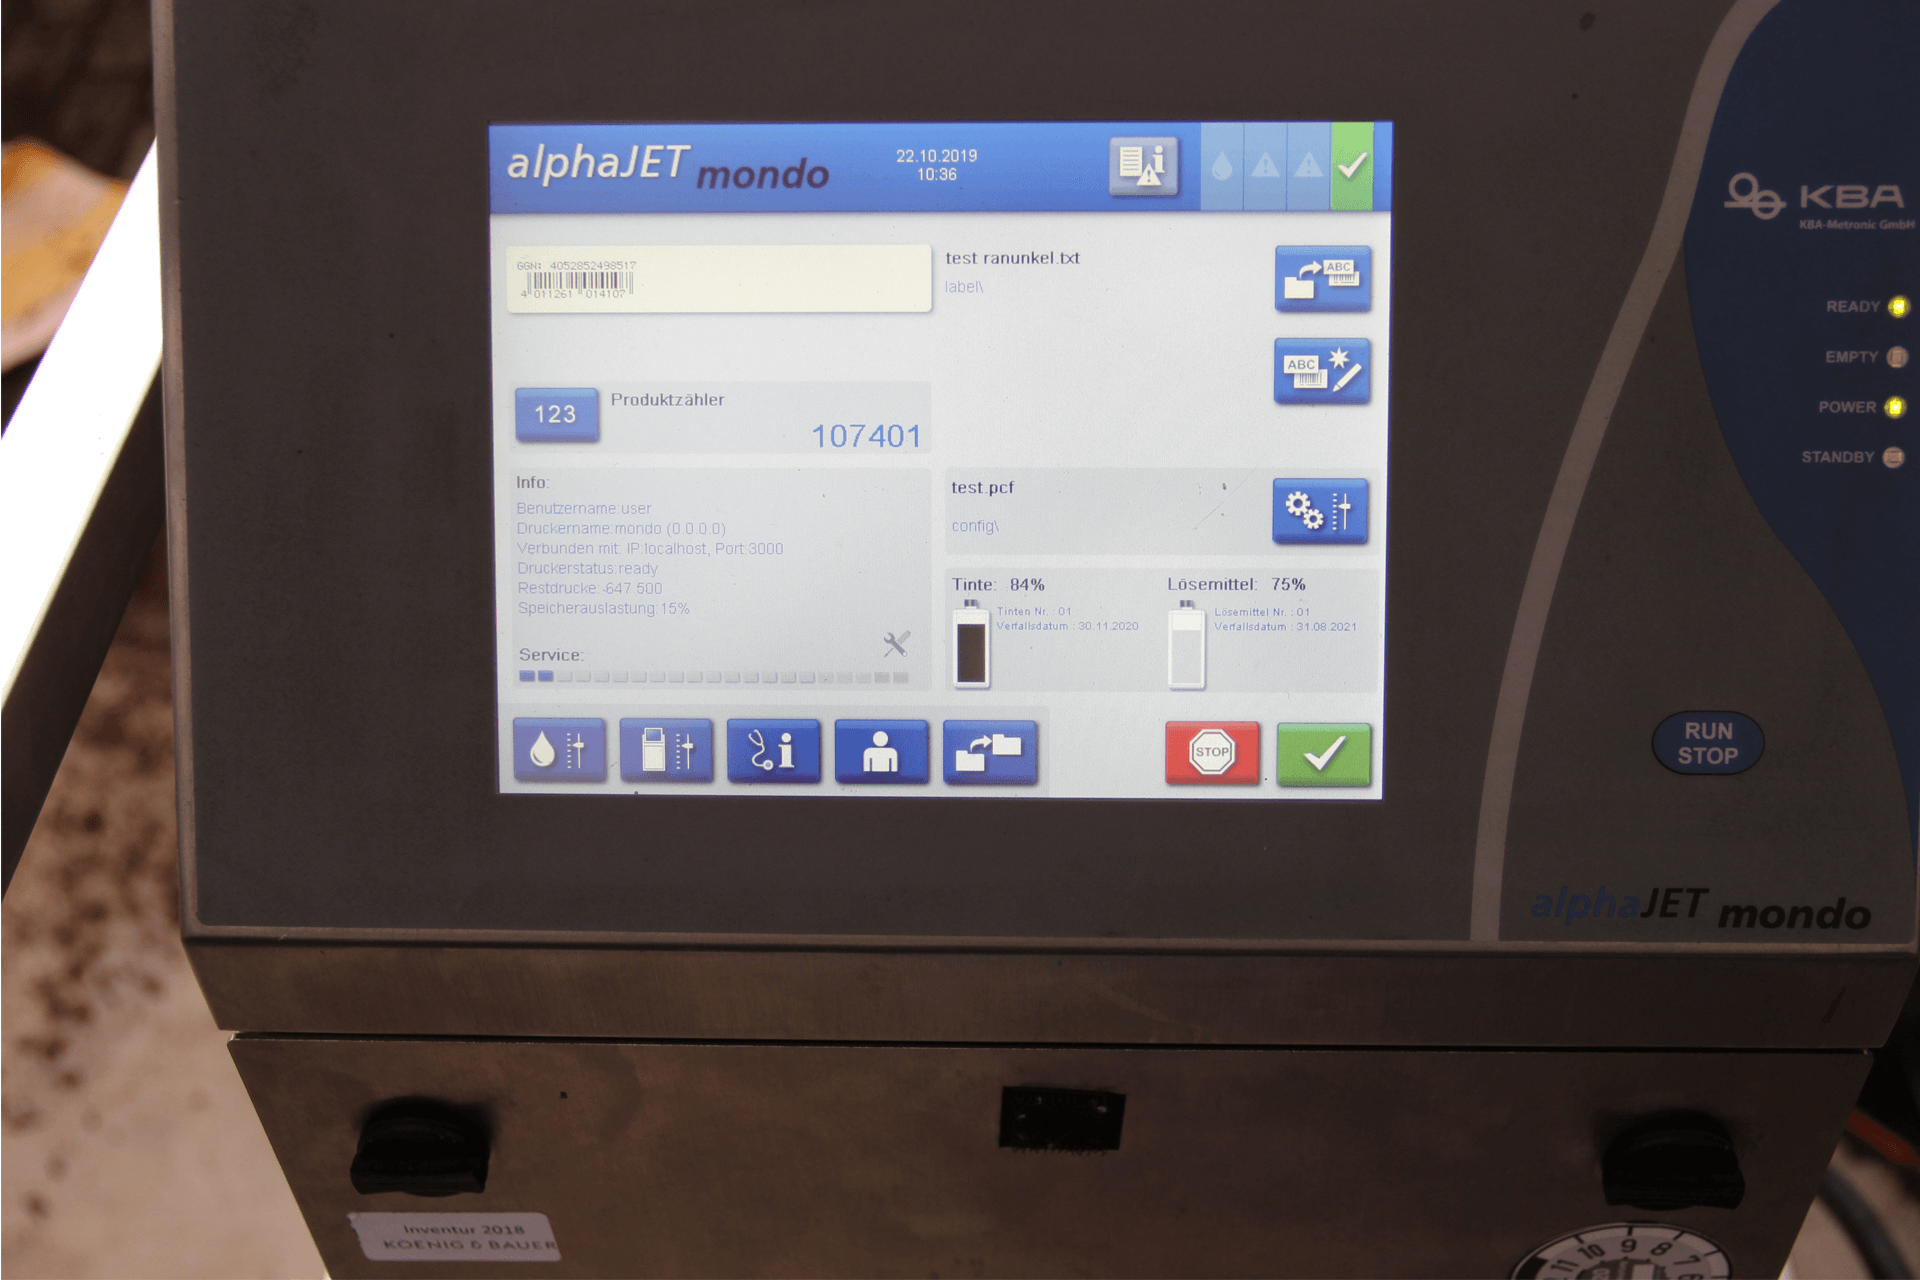 Plant Pot Printing Barcode Image Velmans PrintSafe